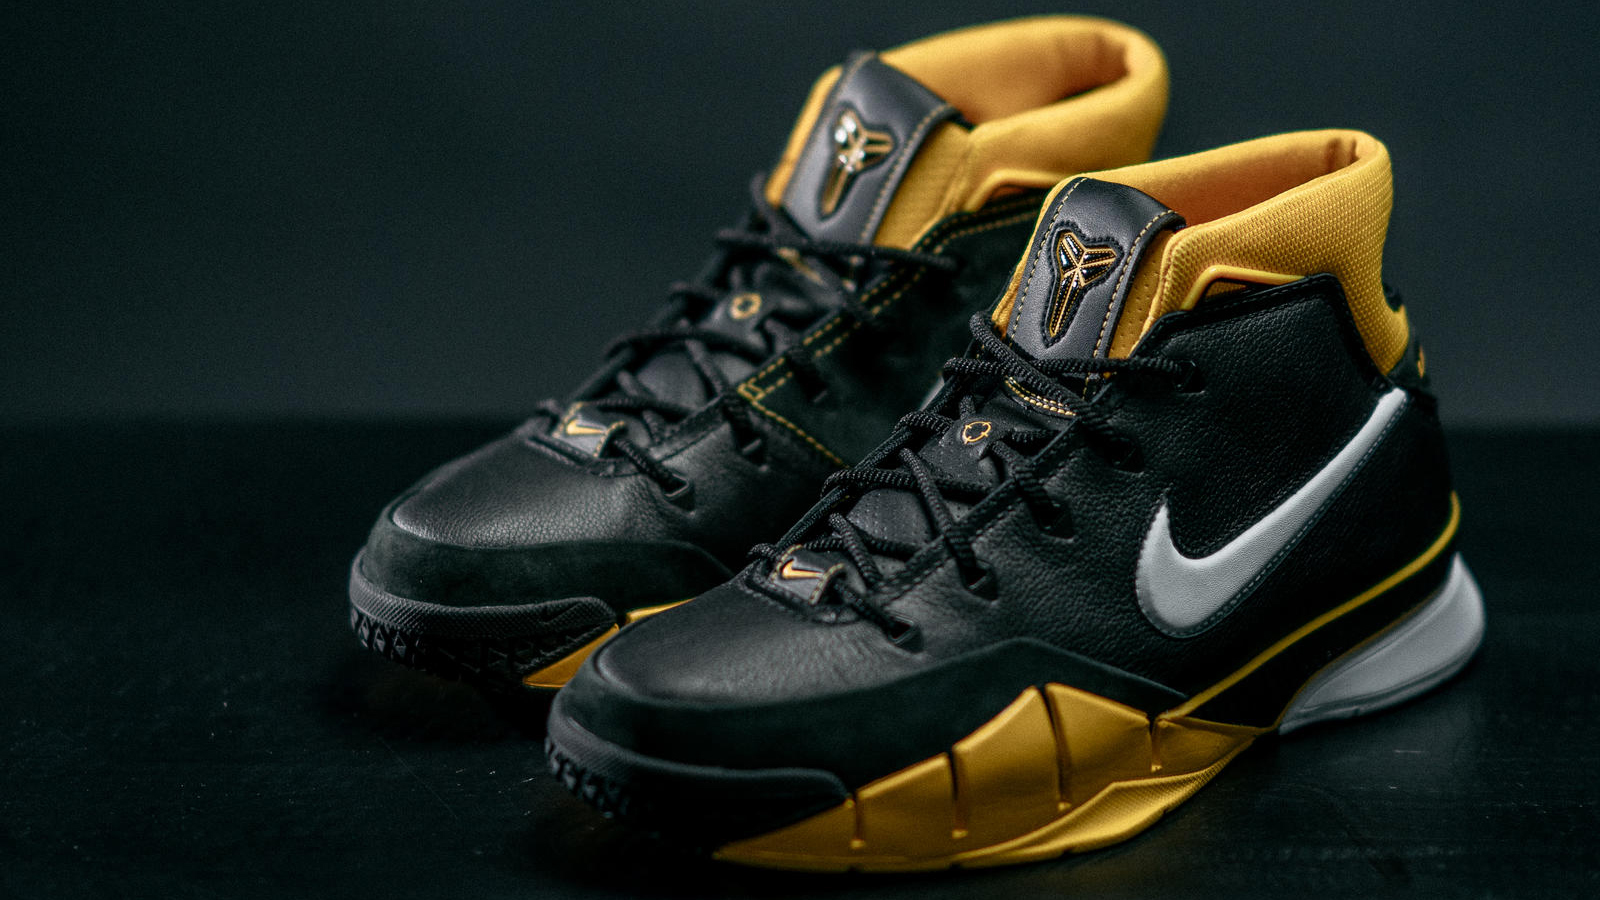 retro'ing his classic Nike Zoom Kobe 1